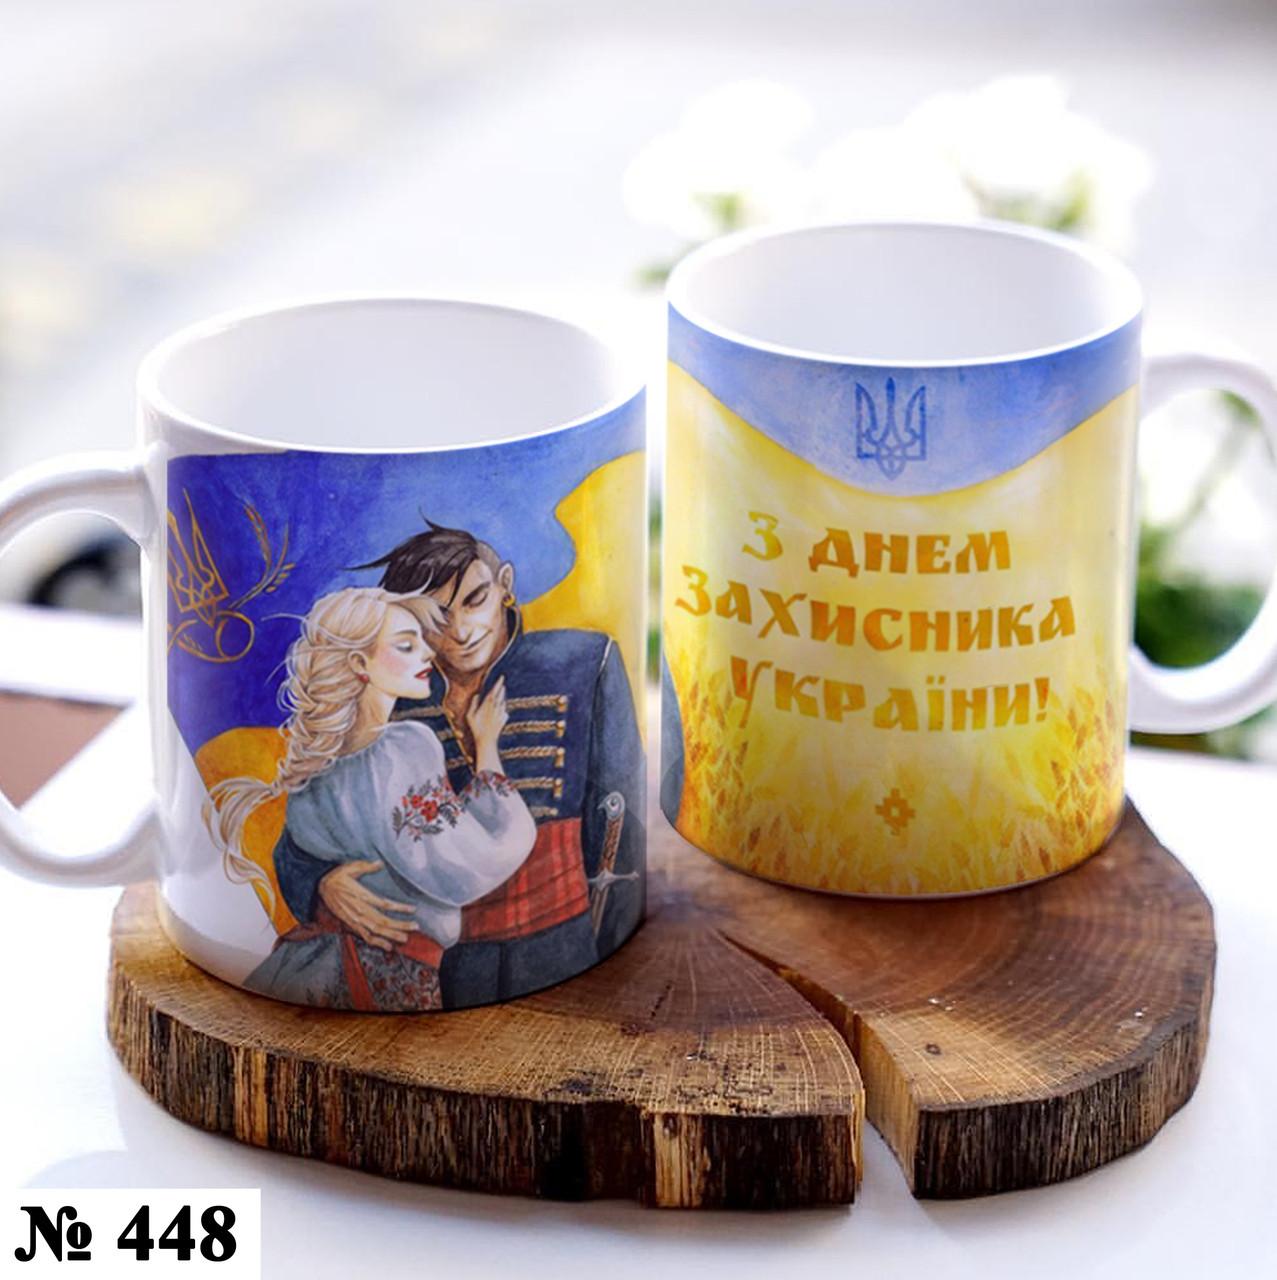 "Чашка з принтом ""З днем Захисника України"" подарунок на День Захисника"